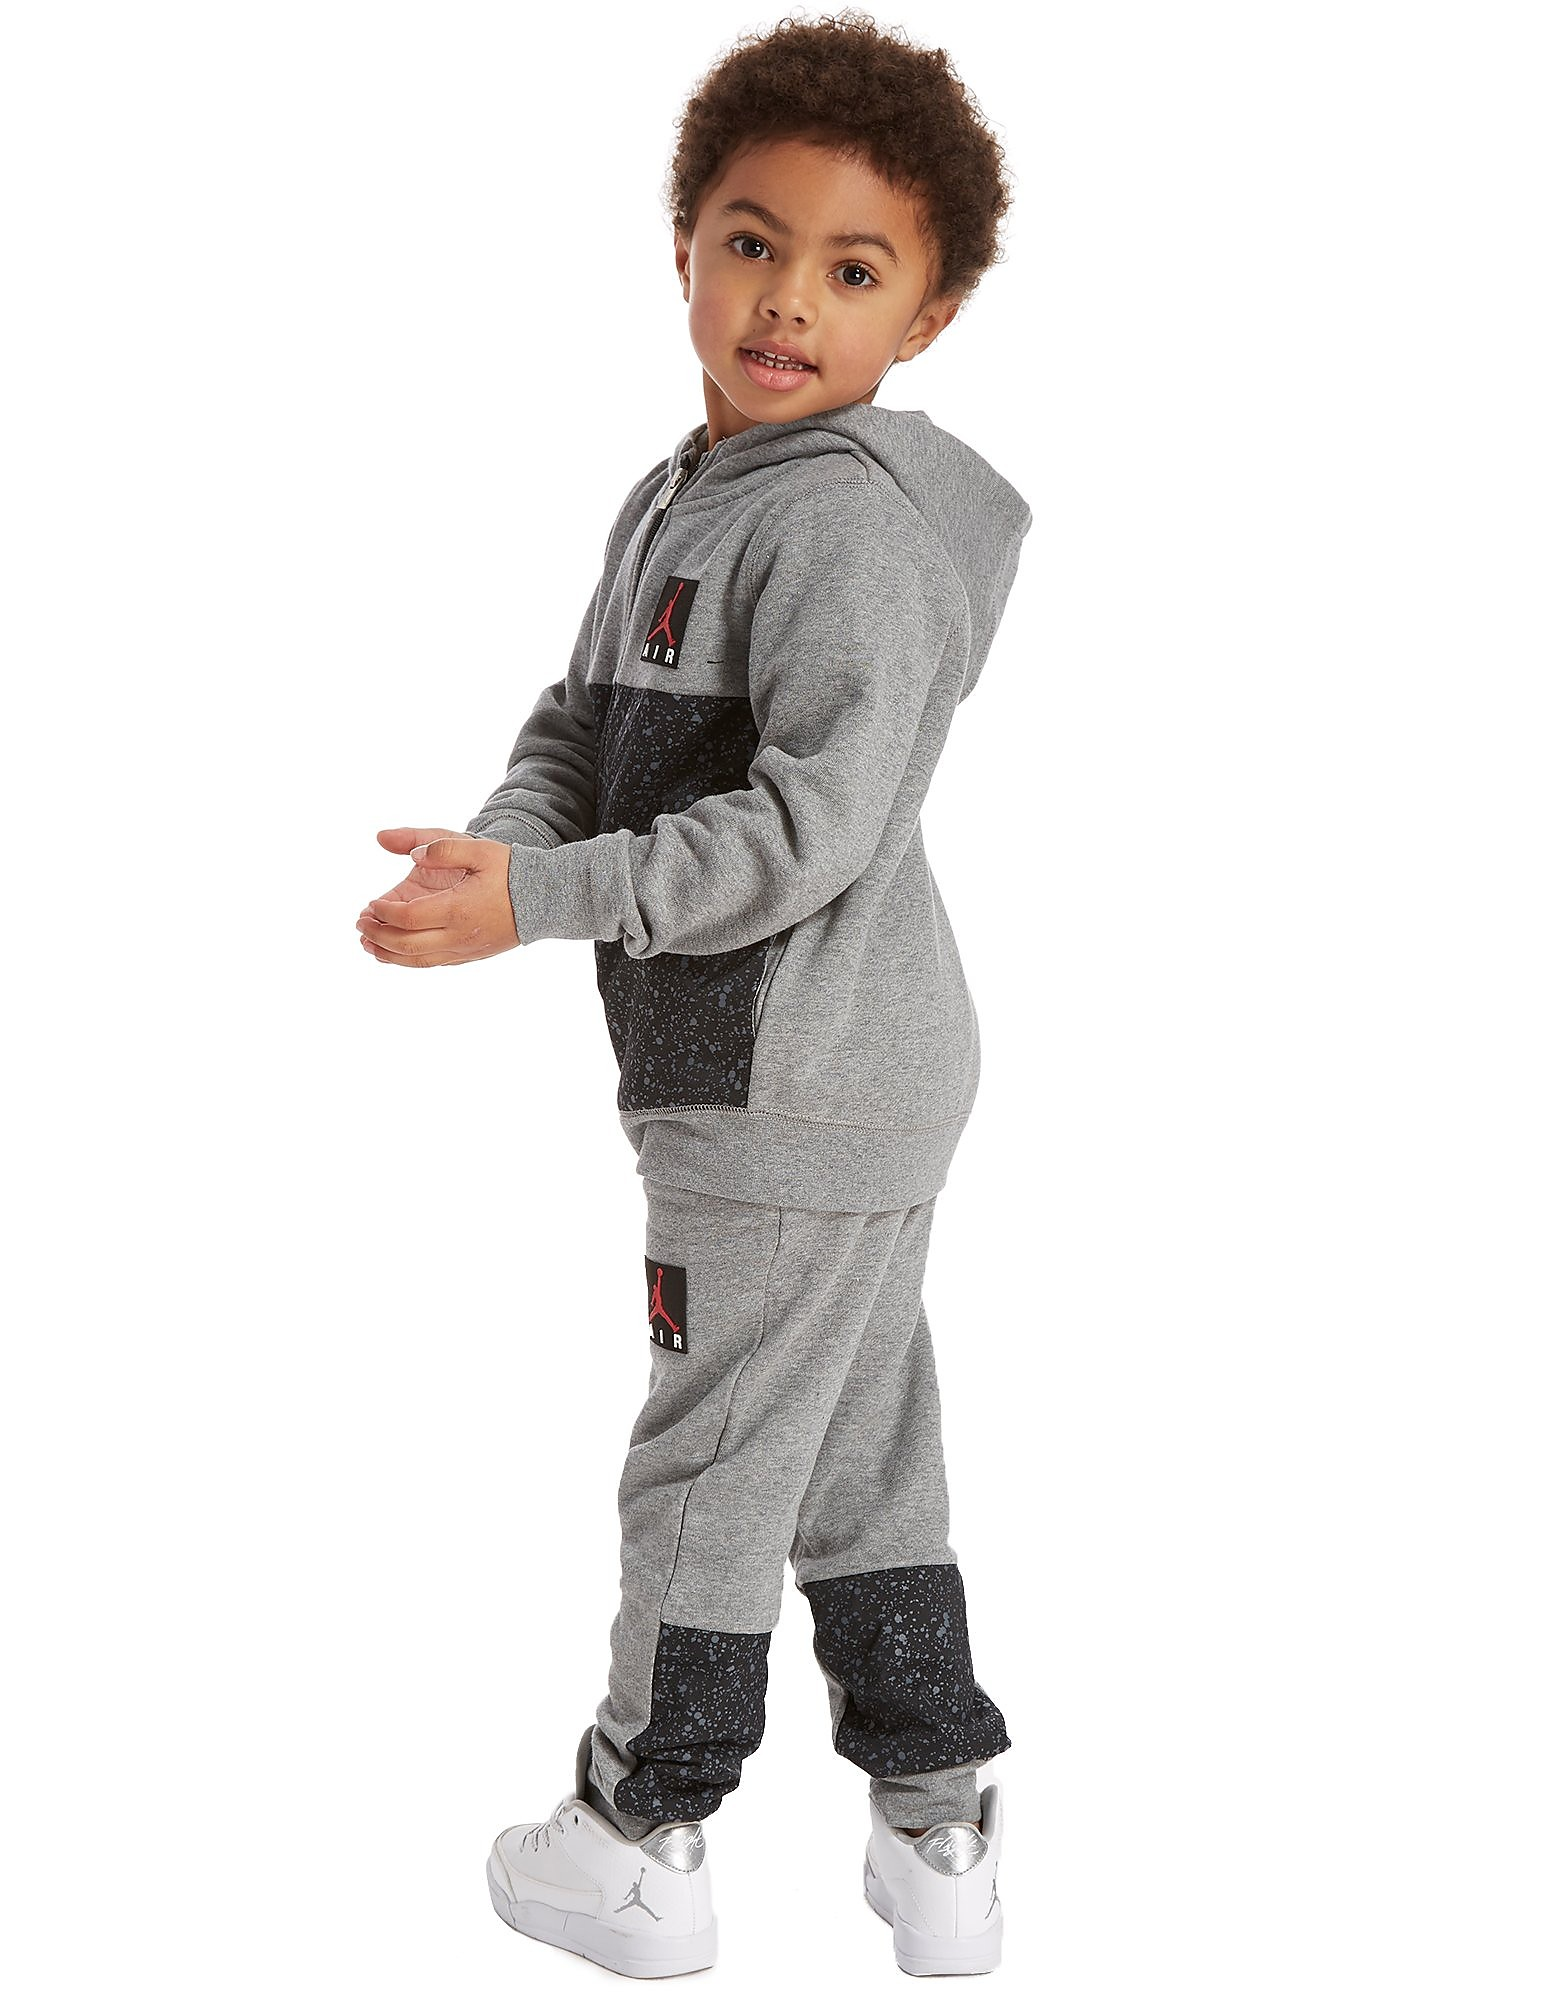 Jordan Cement Full Zip Tracksuit Children